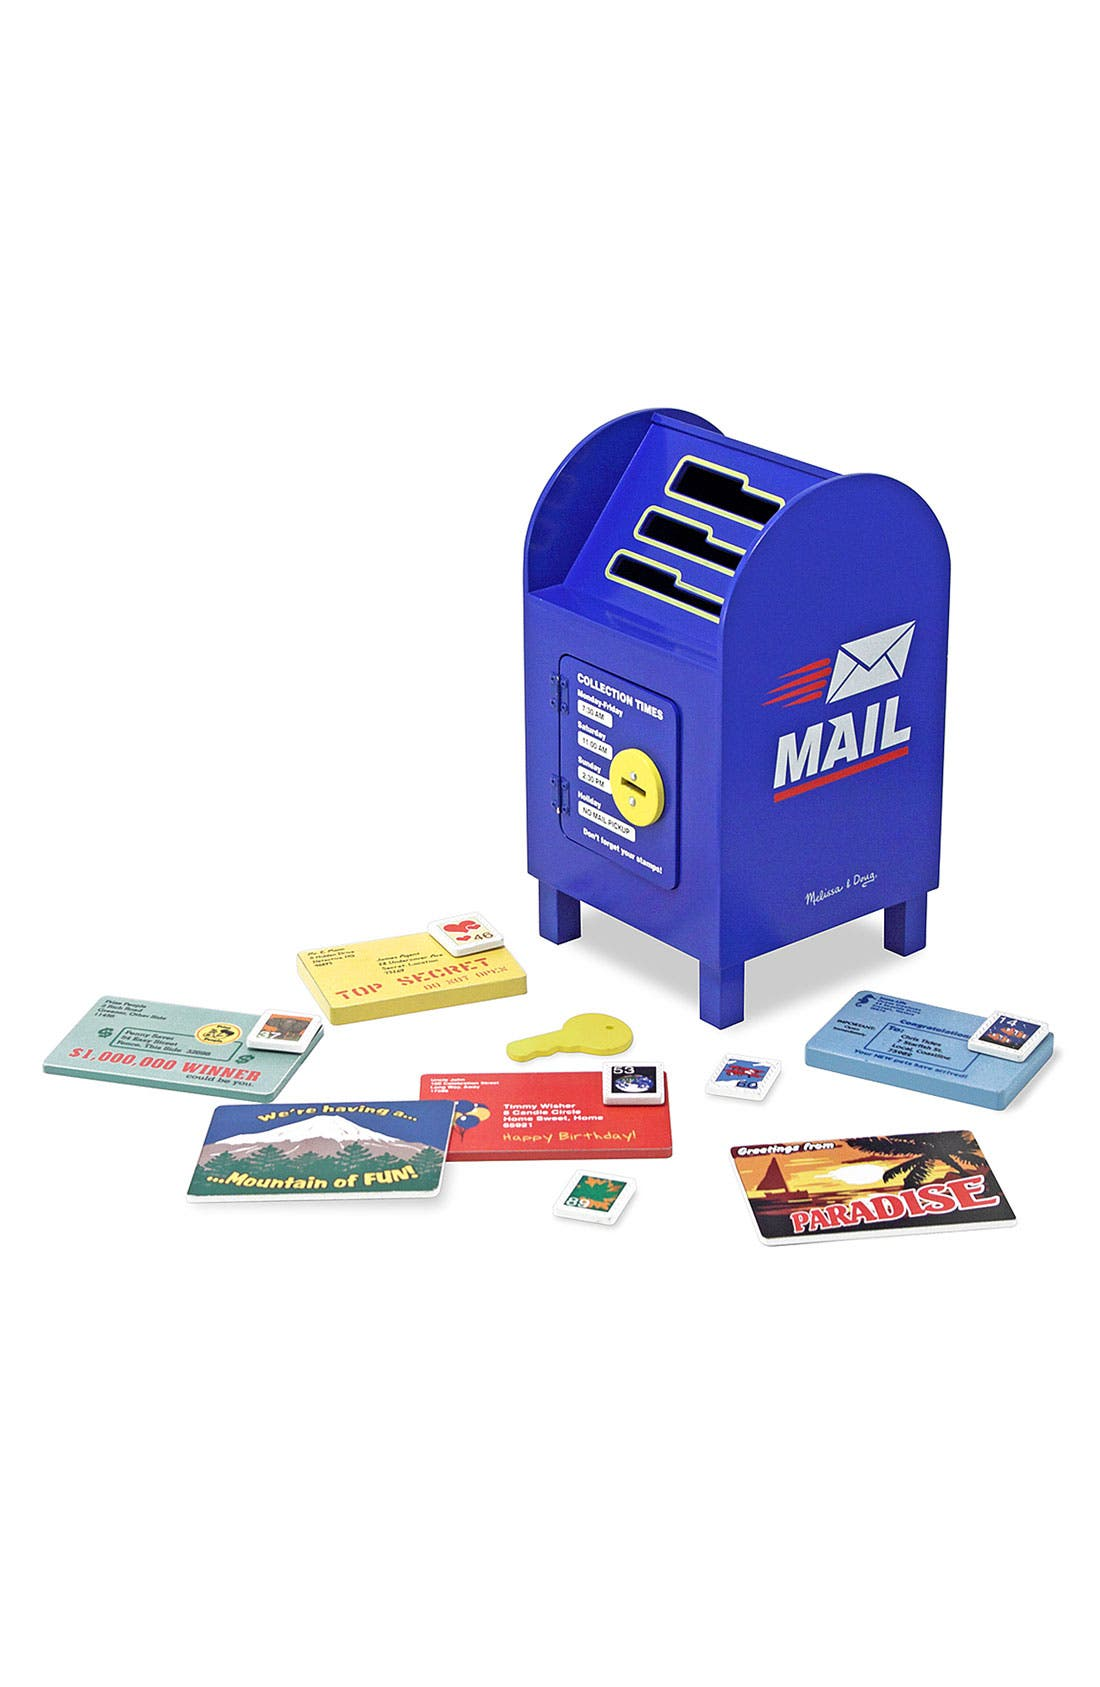 Alternate Image 1 Selected - Melissa & Doug 'Stamp Sort' Mailbox